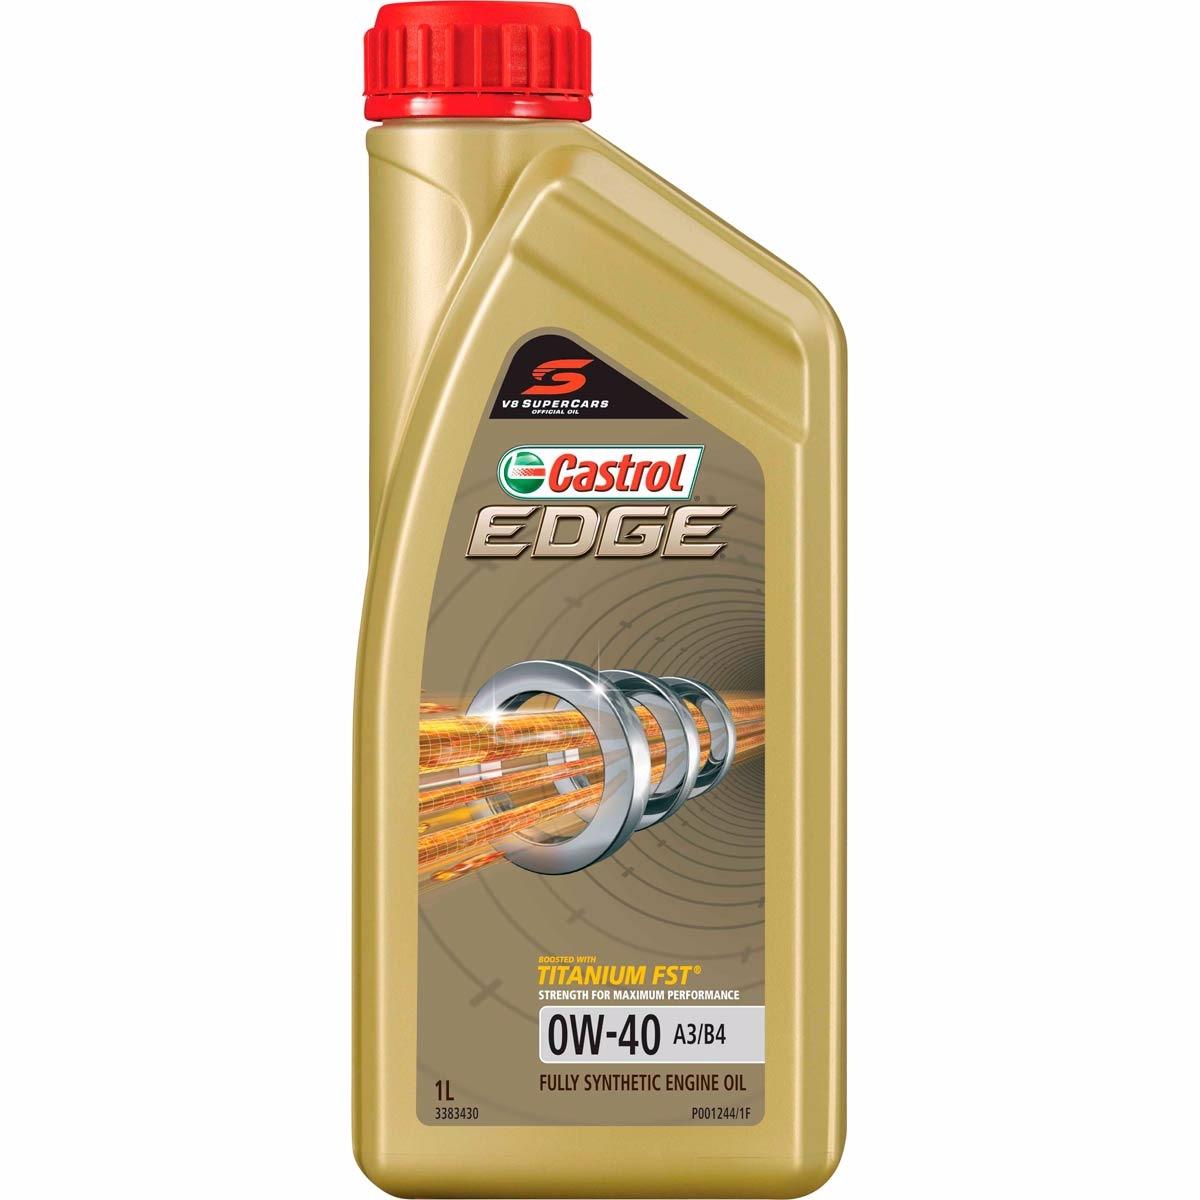 CASTROL Edge 0W40 1 liter (1412501149001)